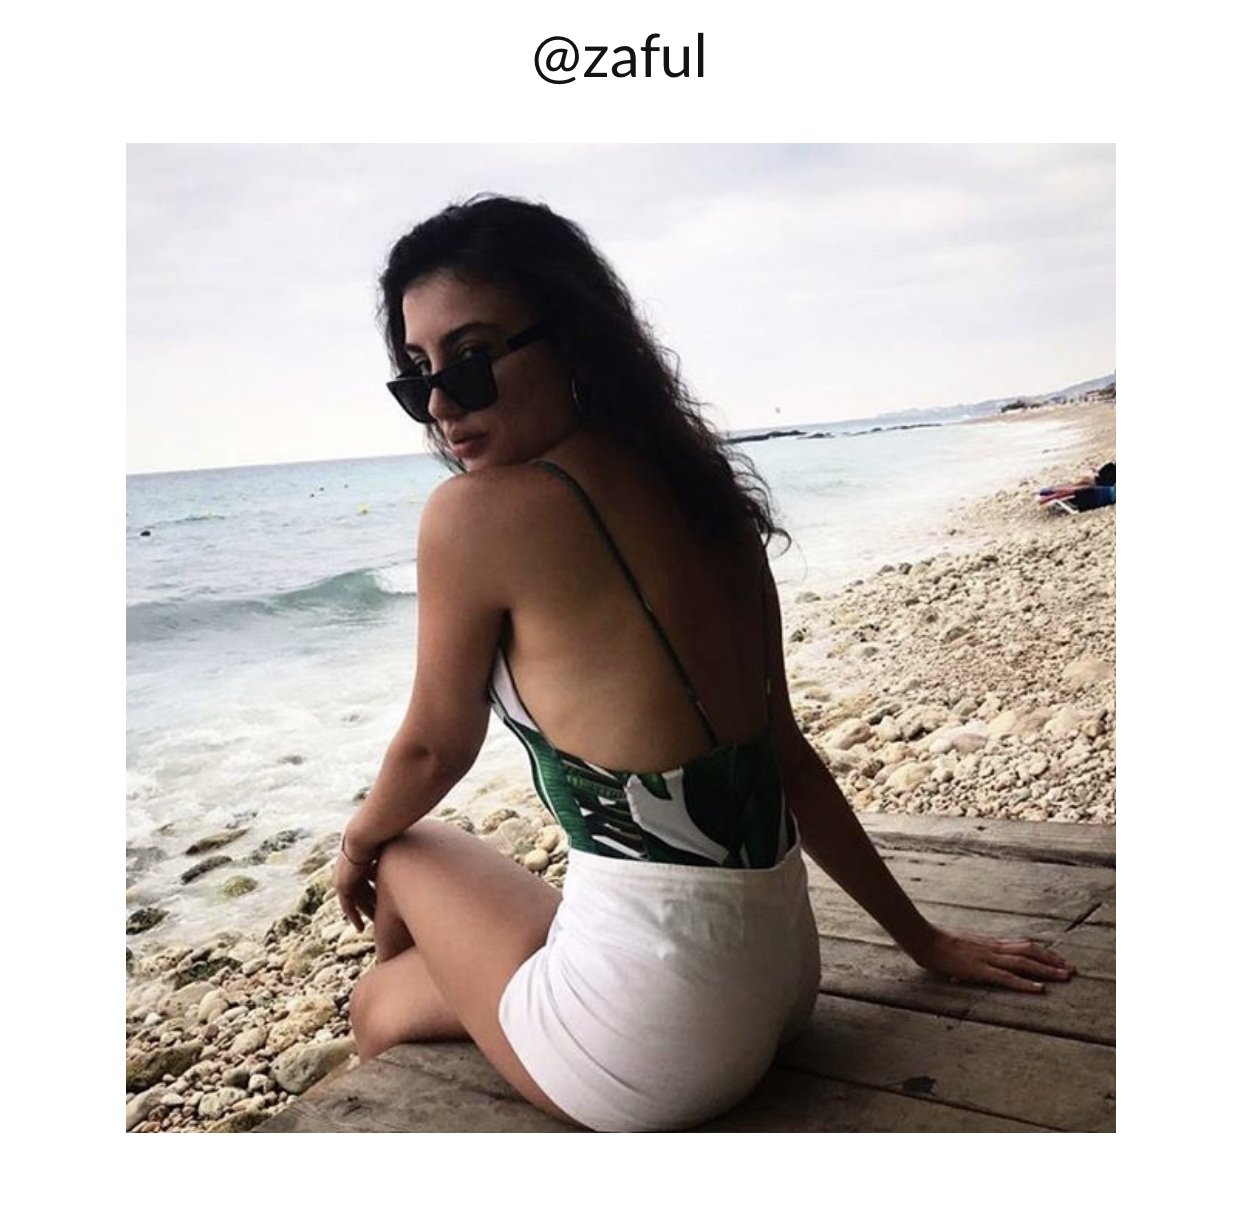 @carmenrose.c's snapchat picture for zaful